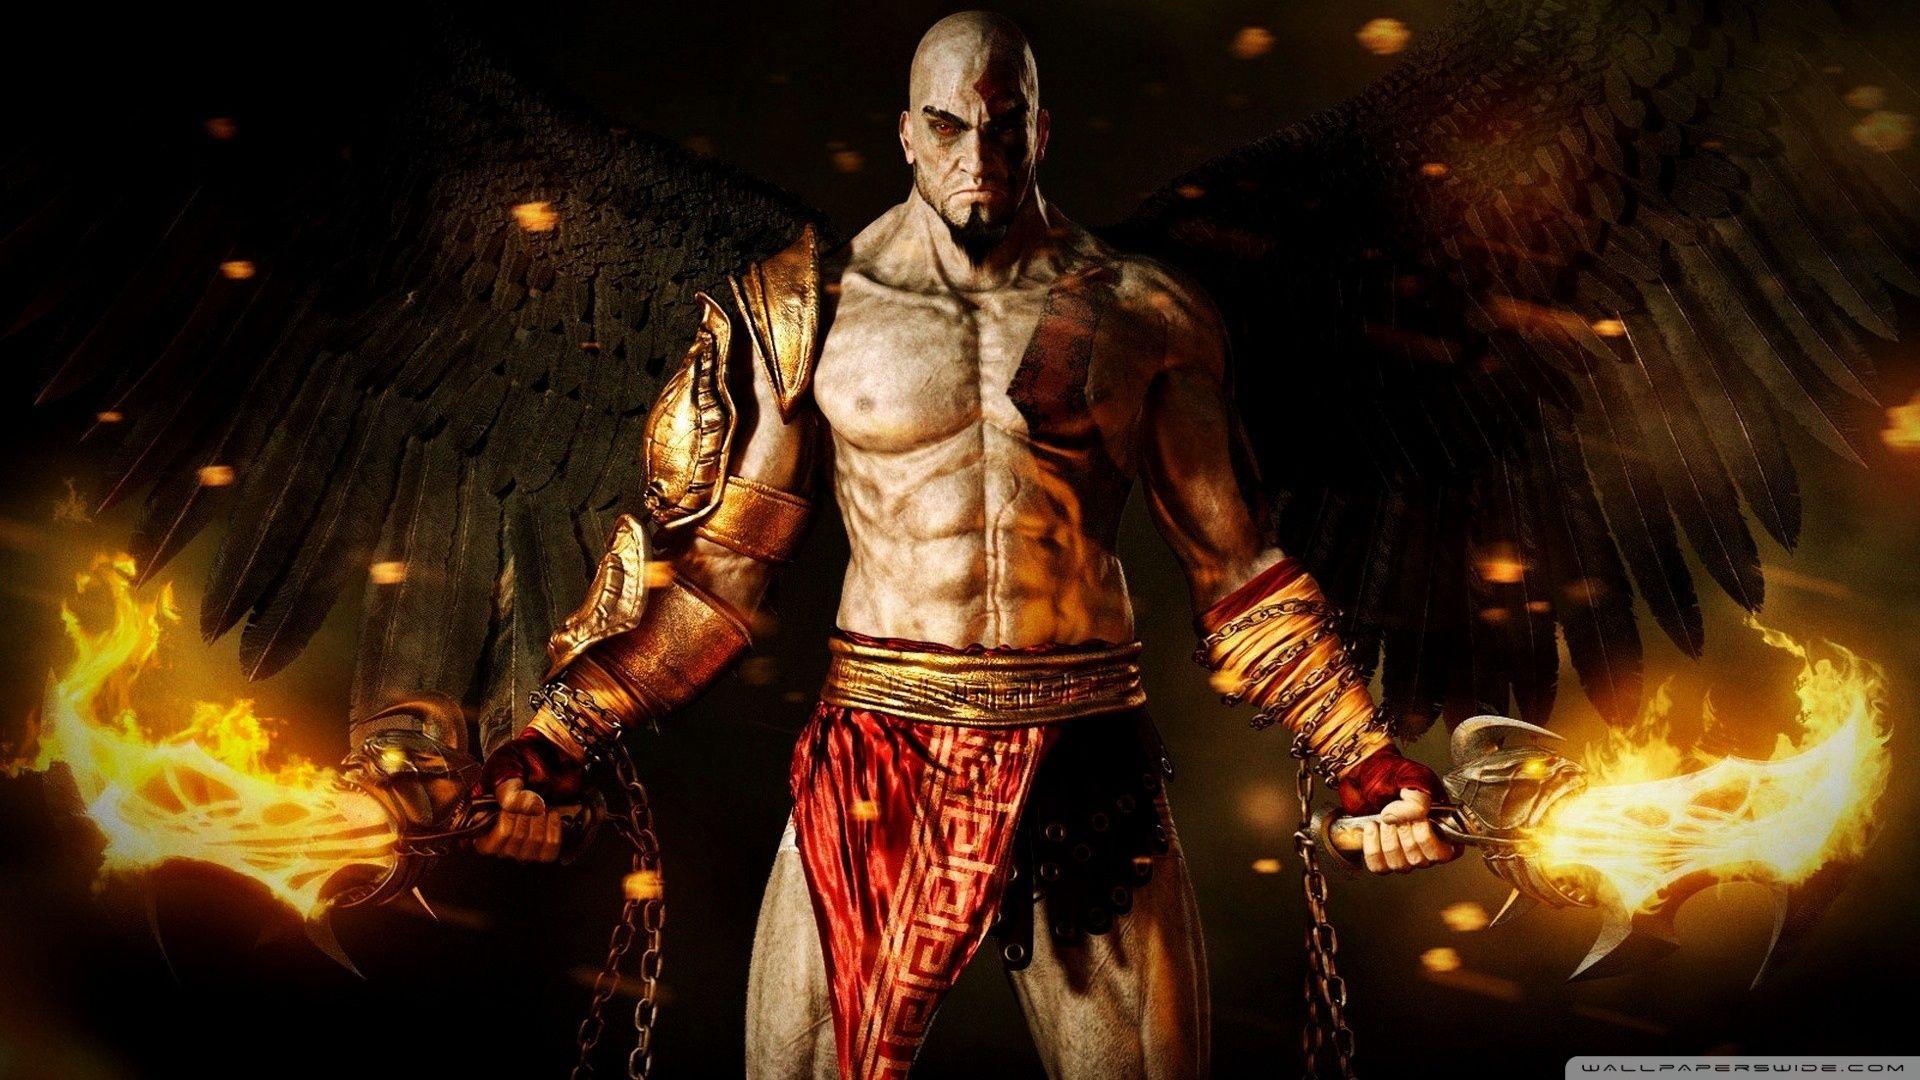 Full Hd 1080p God Of War 4 Wallpaper Kratos God Of War God Of War God Of War Series 1080p god of war full hd wallpaper